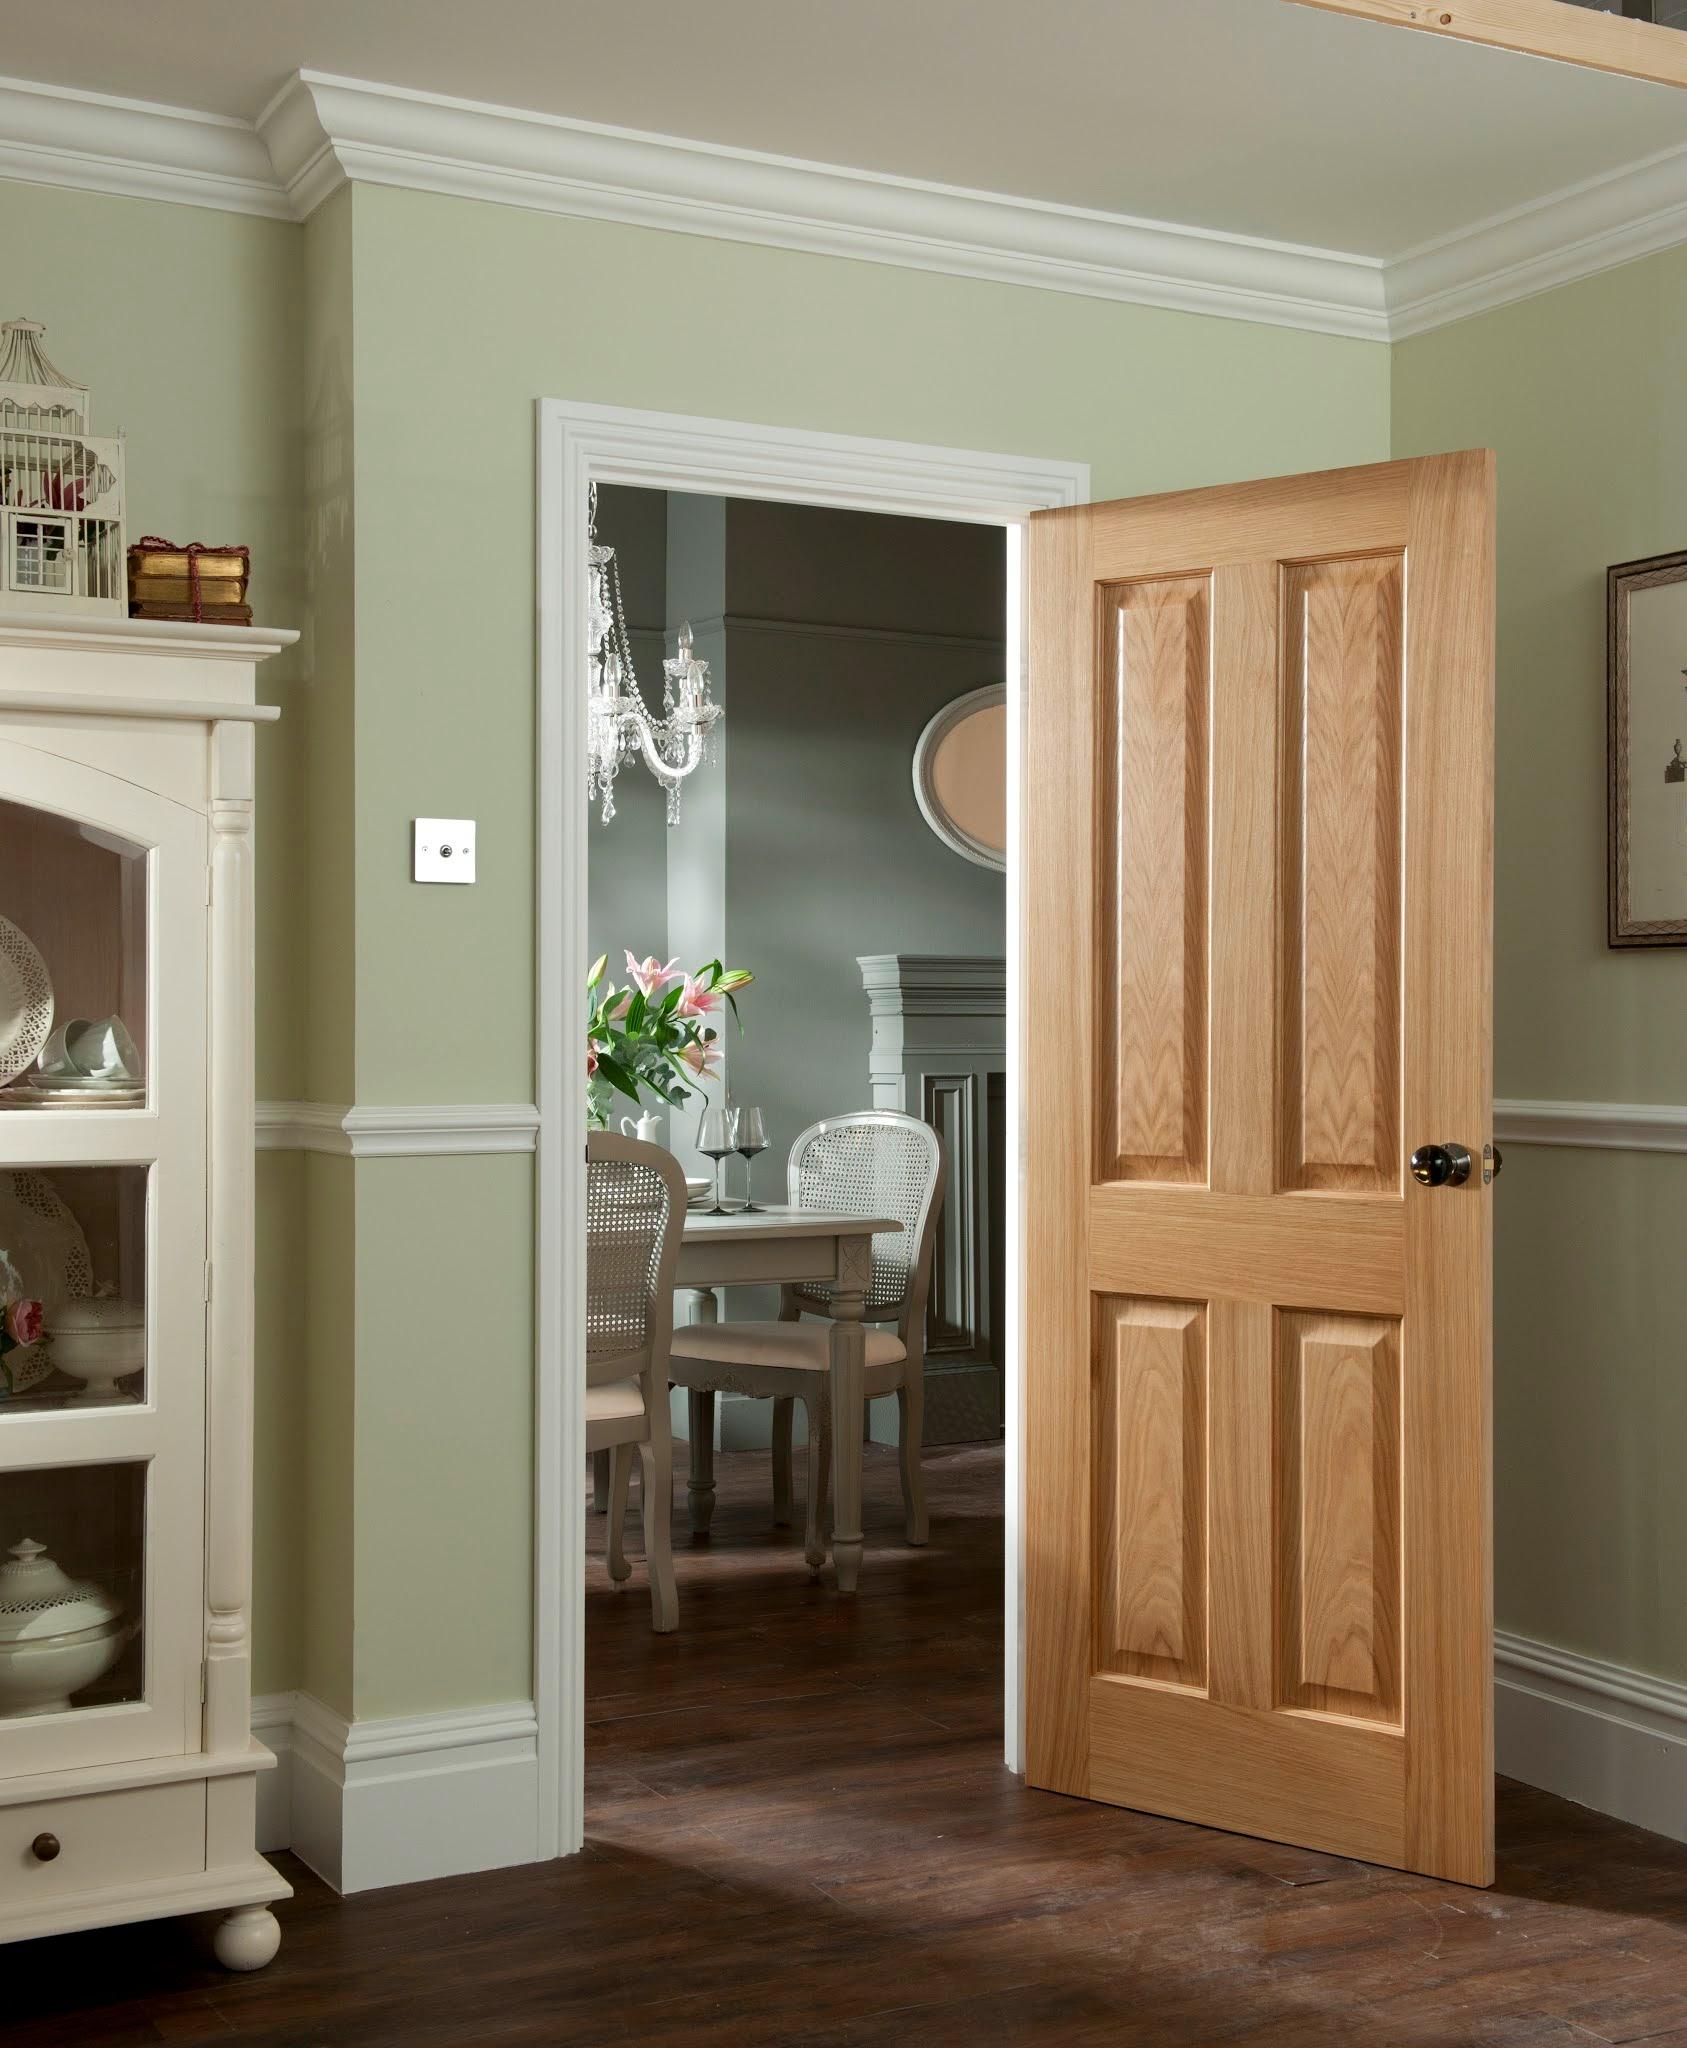 Brilliant Discontinued Kitchen Cupboard Doors Homebase Kitchens Jeld Wen Uk Google